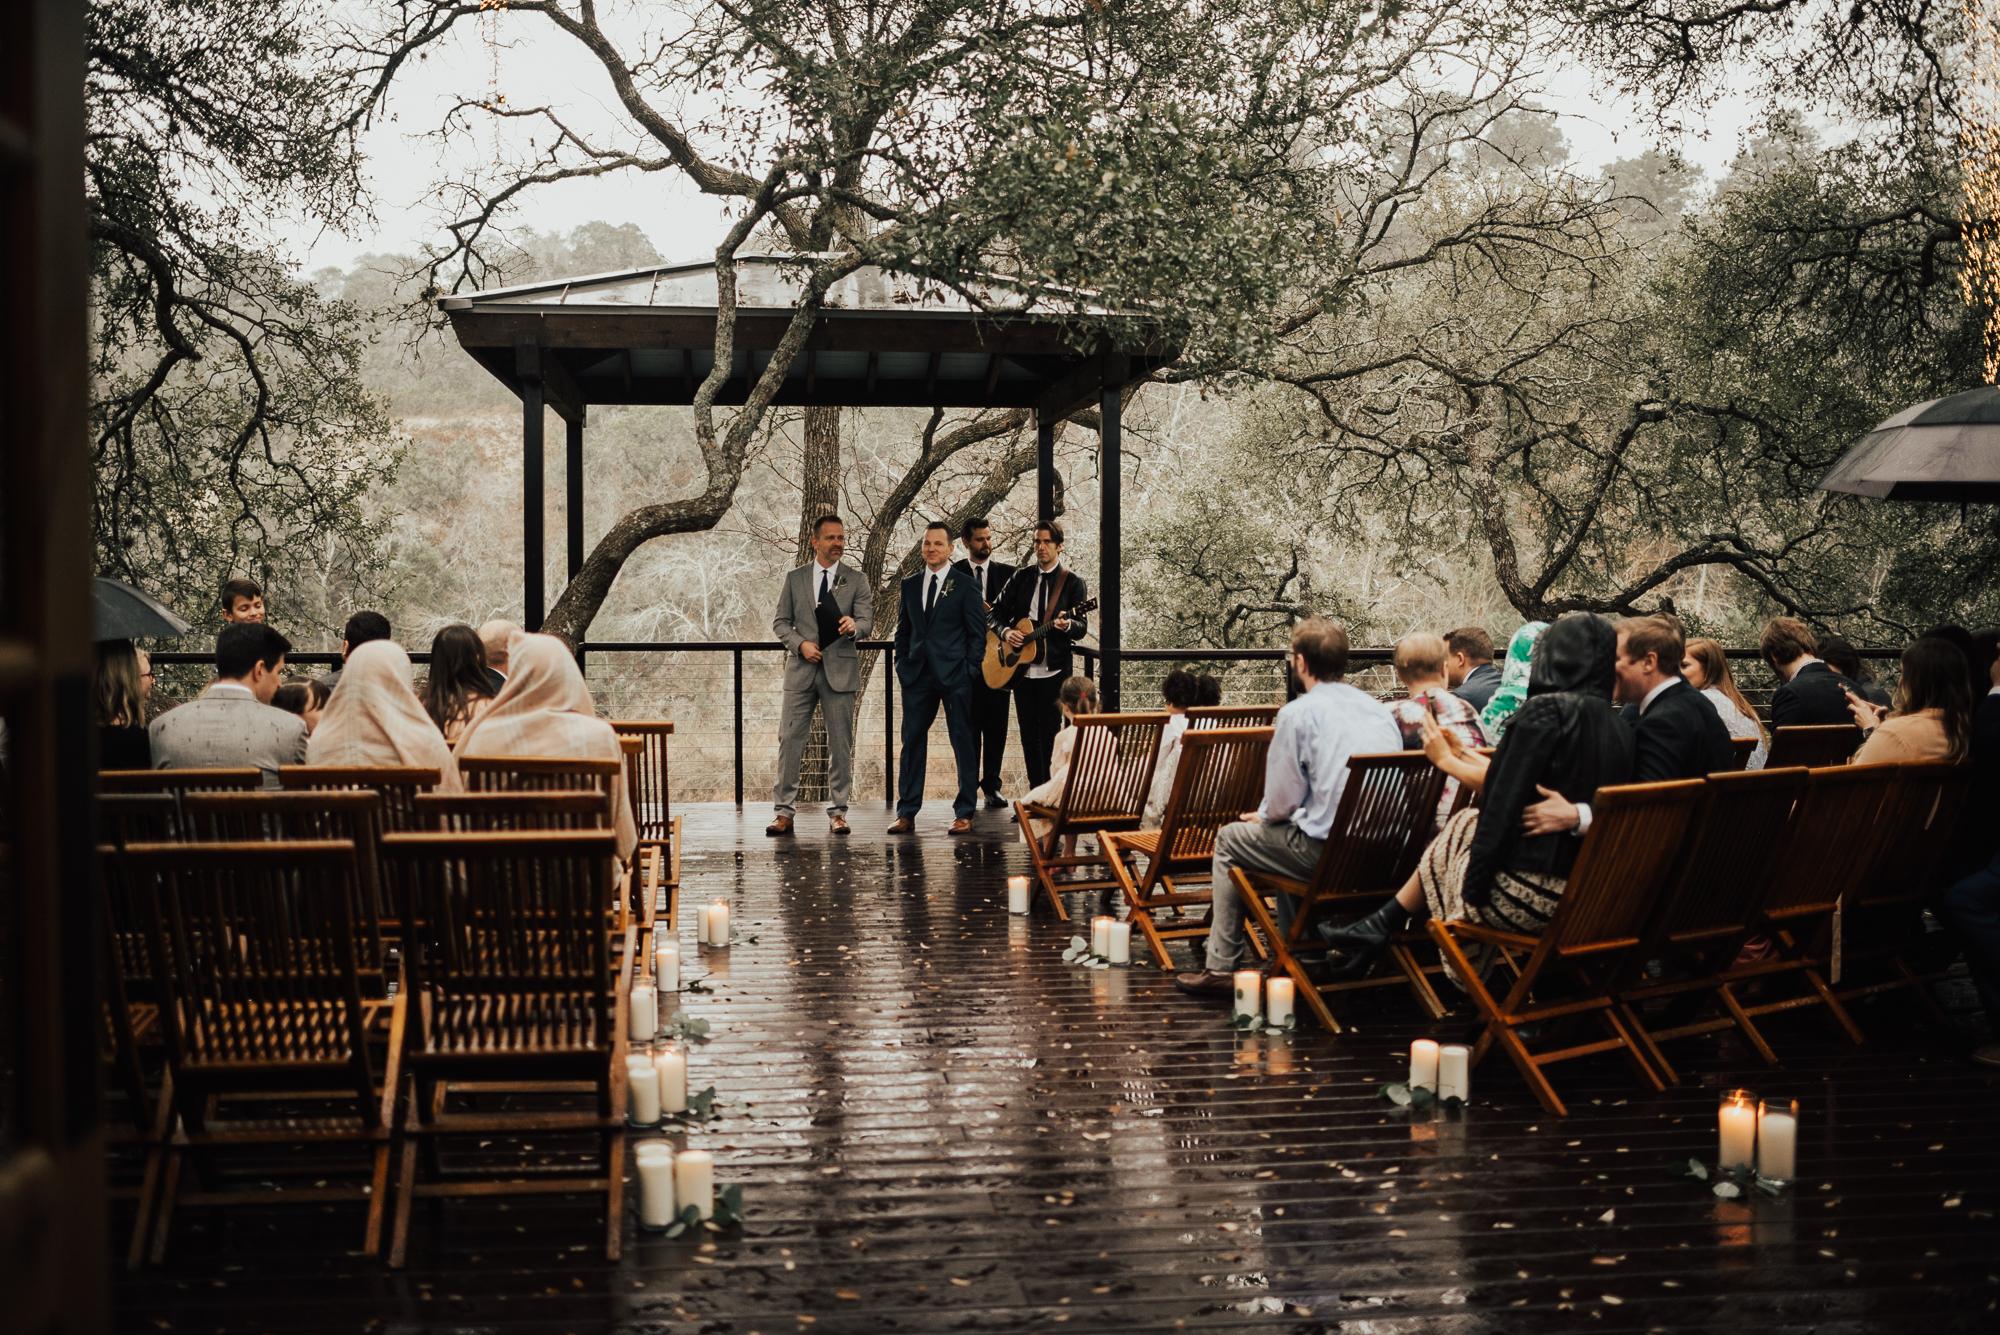 camp-lucy-wedding-187.jpg